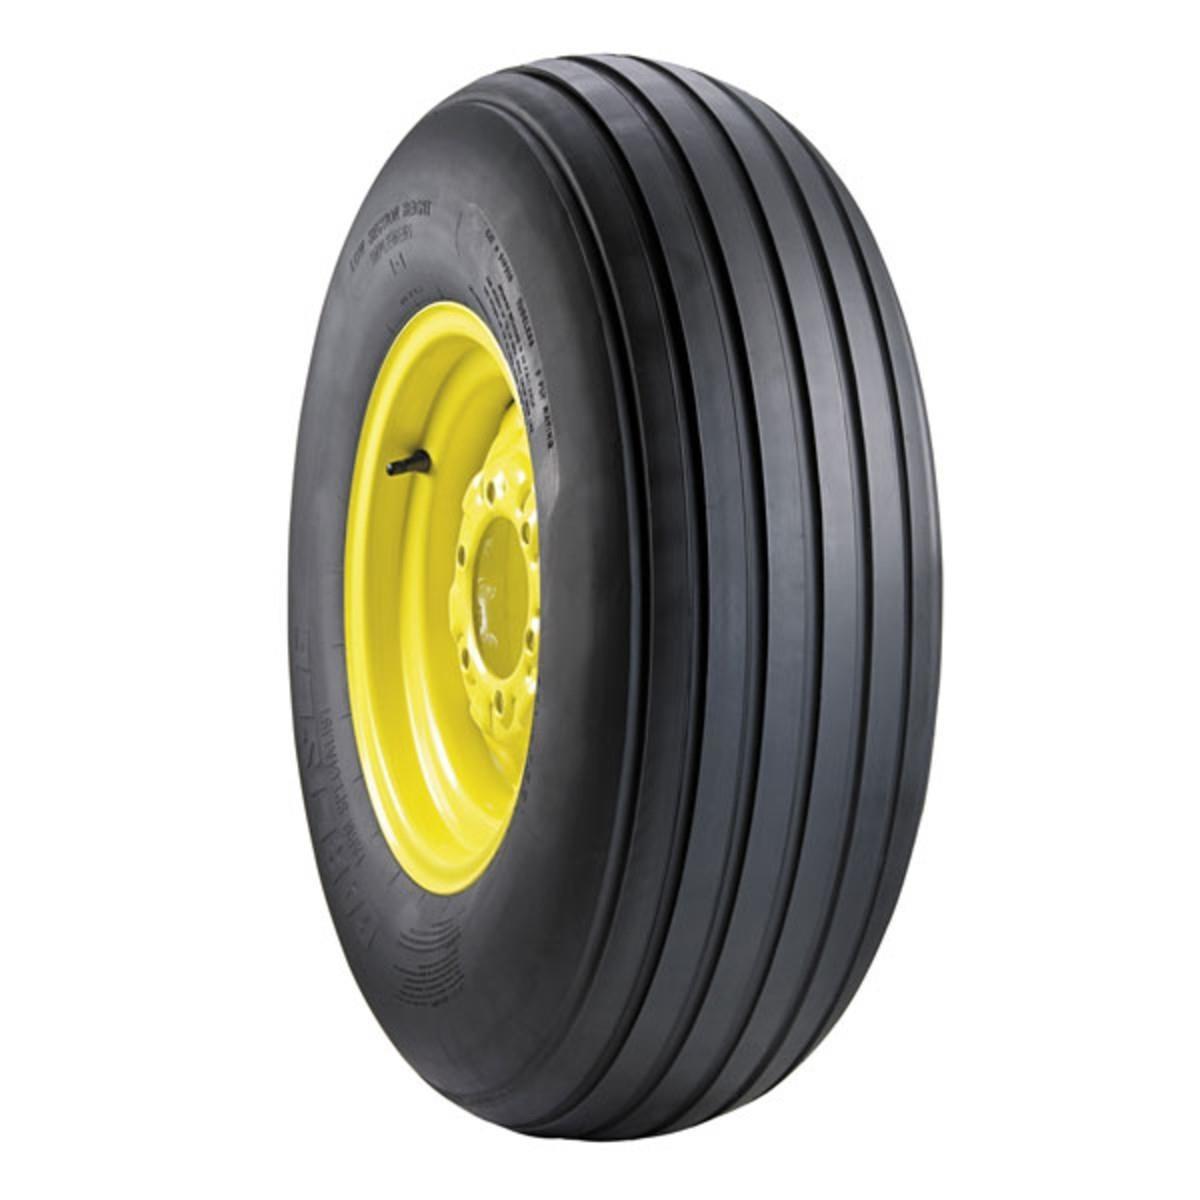 Carlisle 9.5L-15 Wheels / Tires / Track